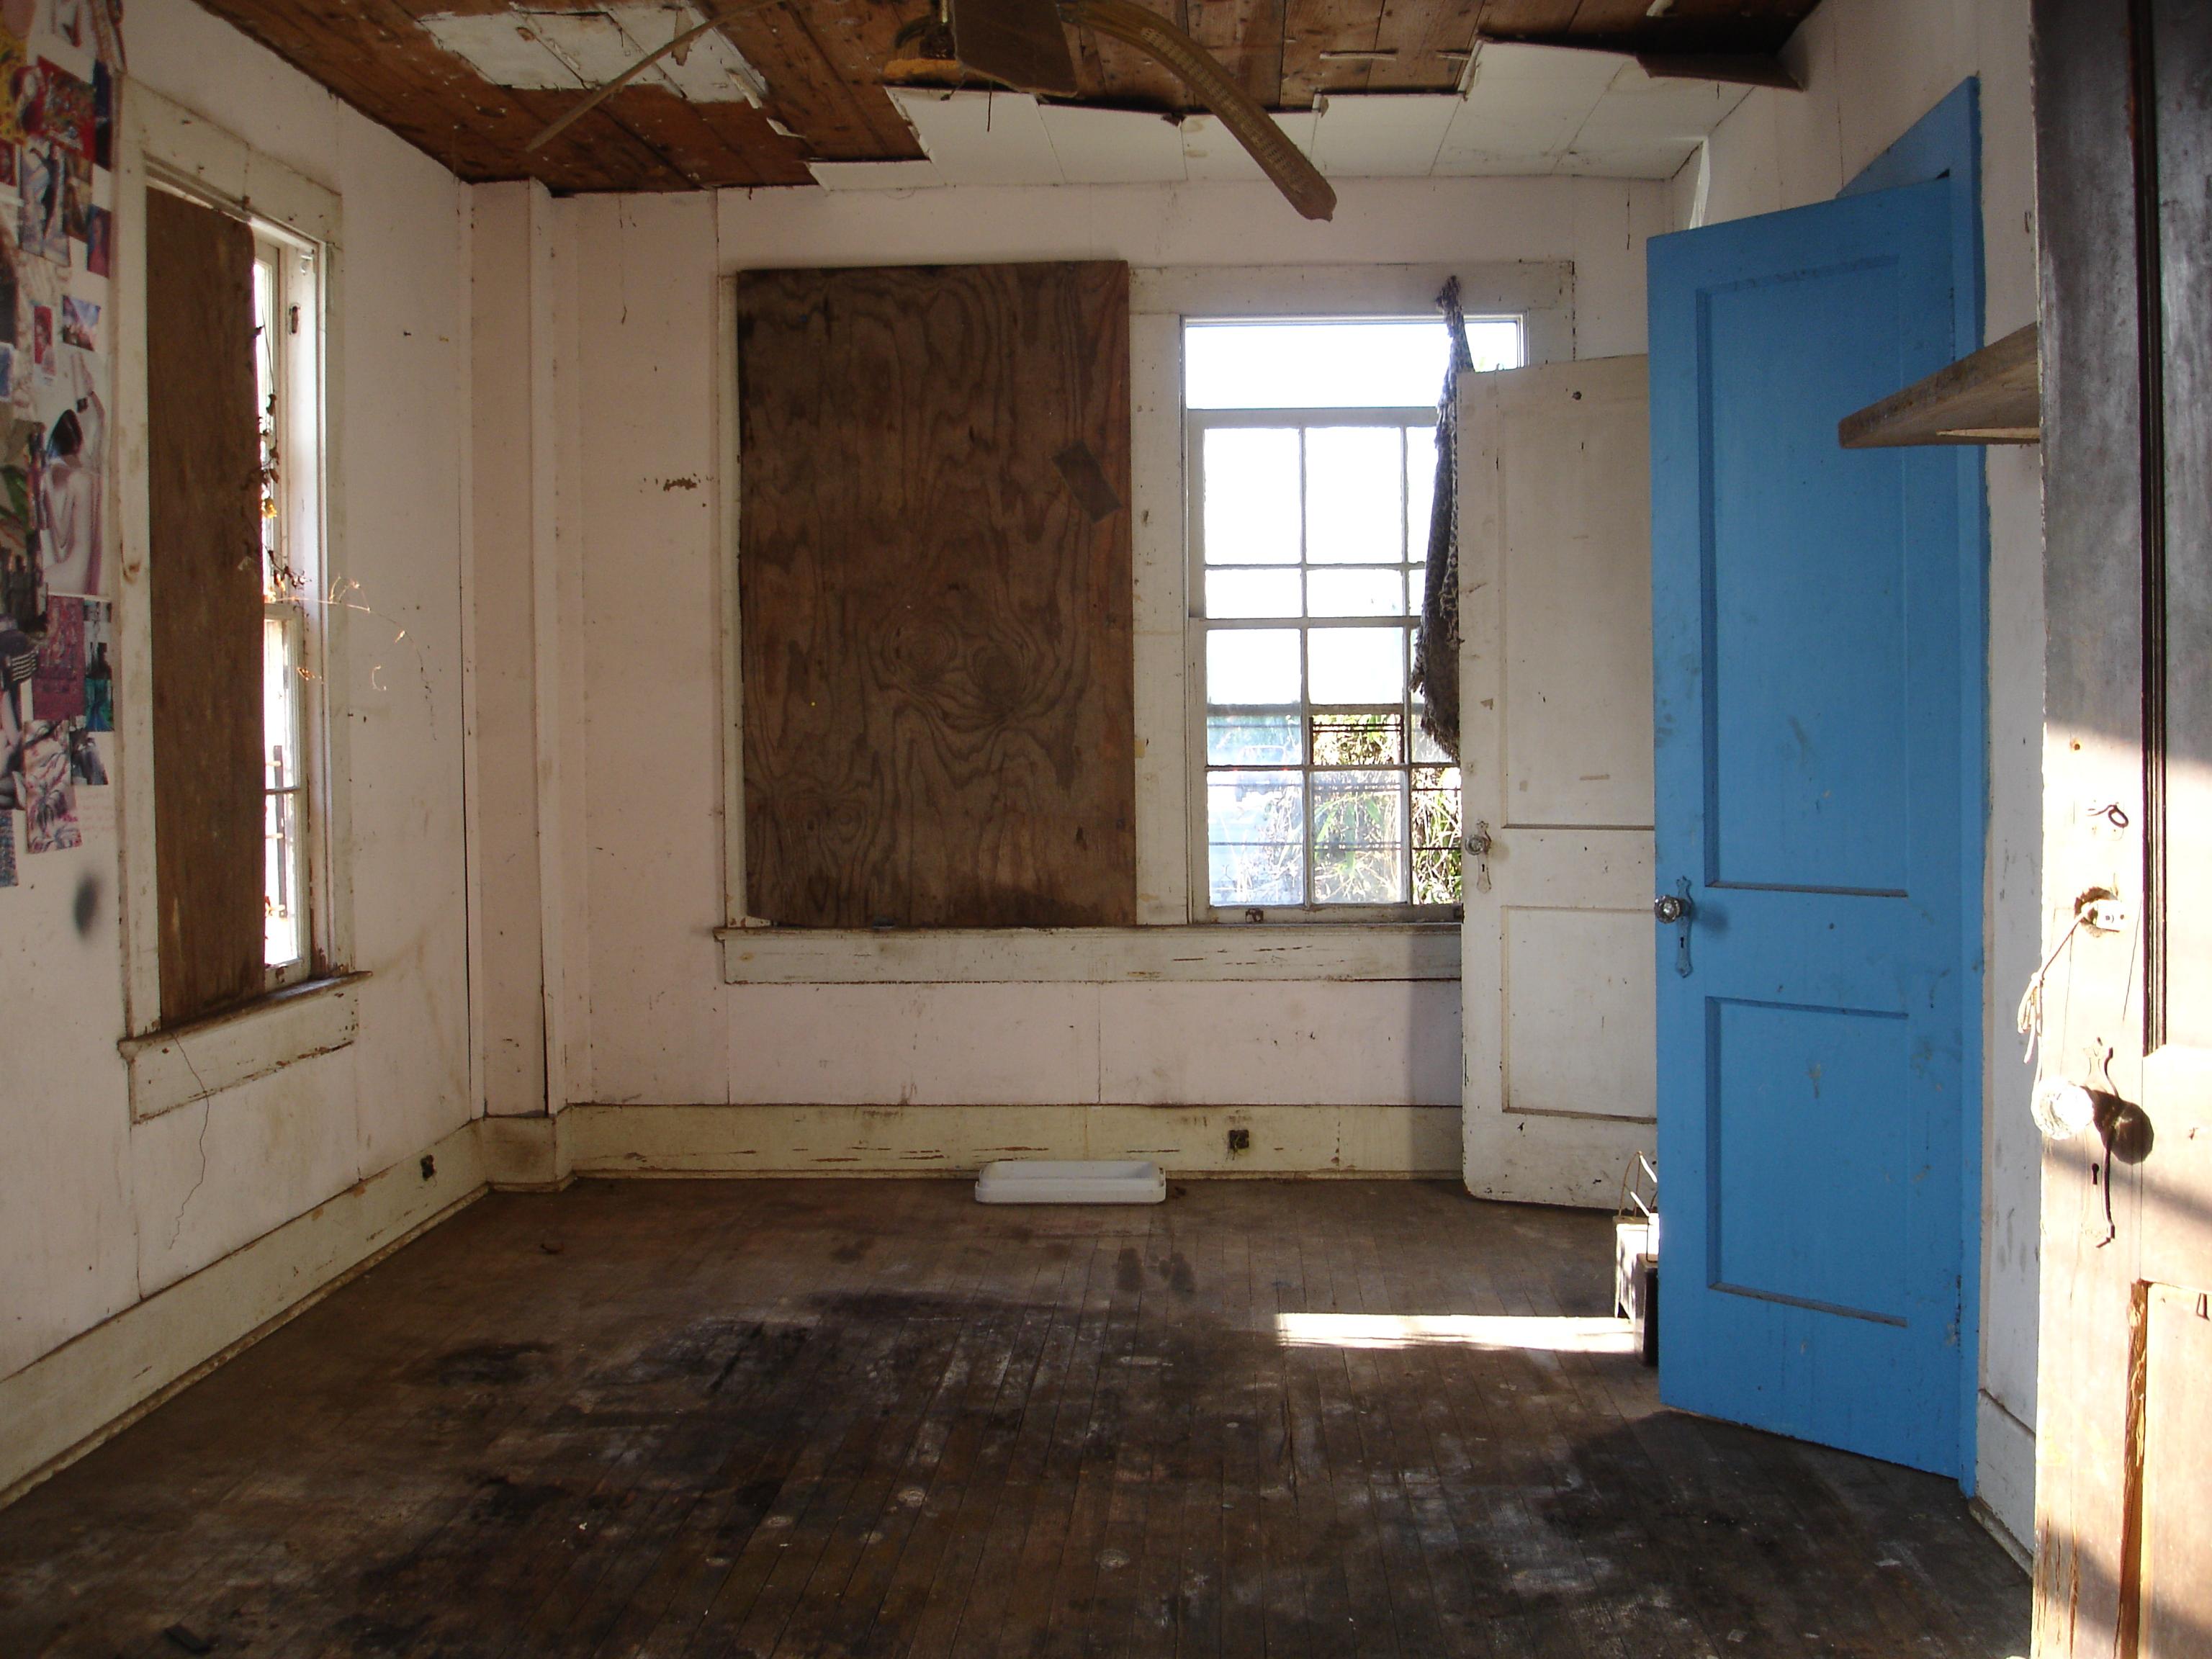 Abandoned Baton Rouge State Street Housing